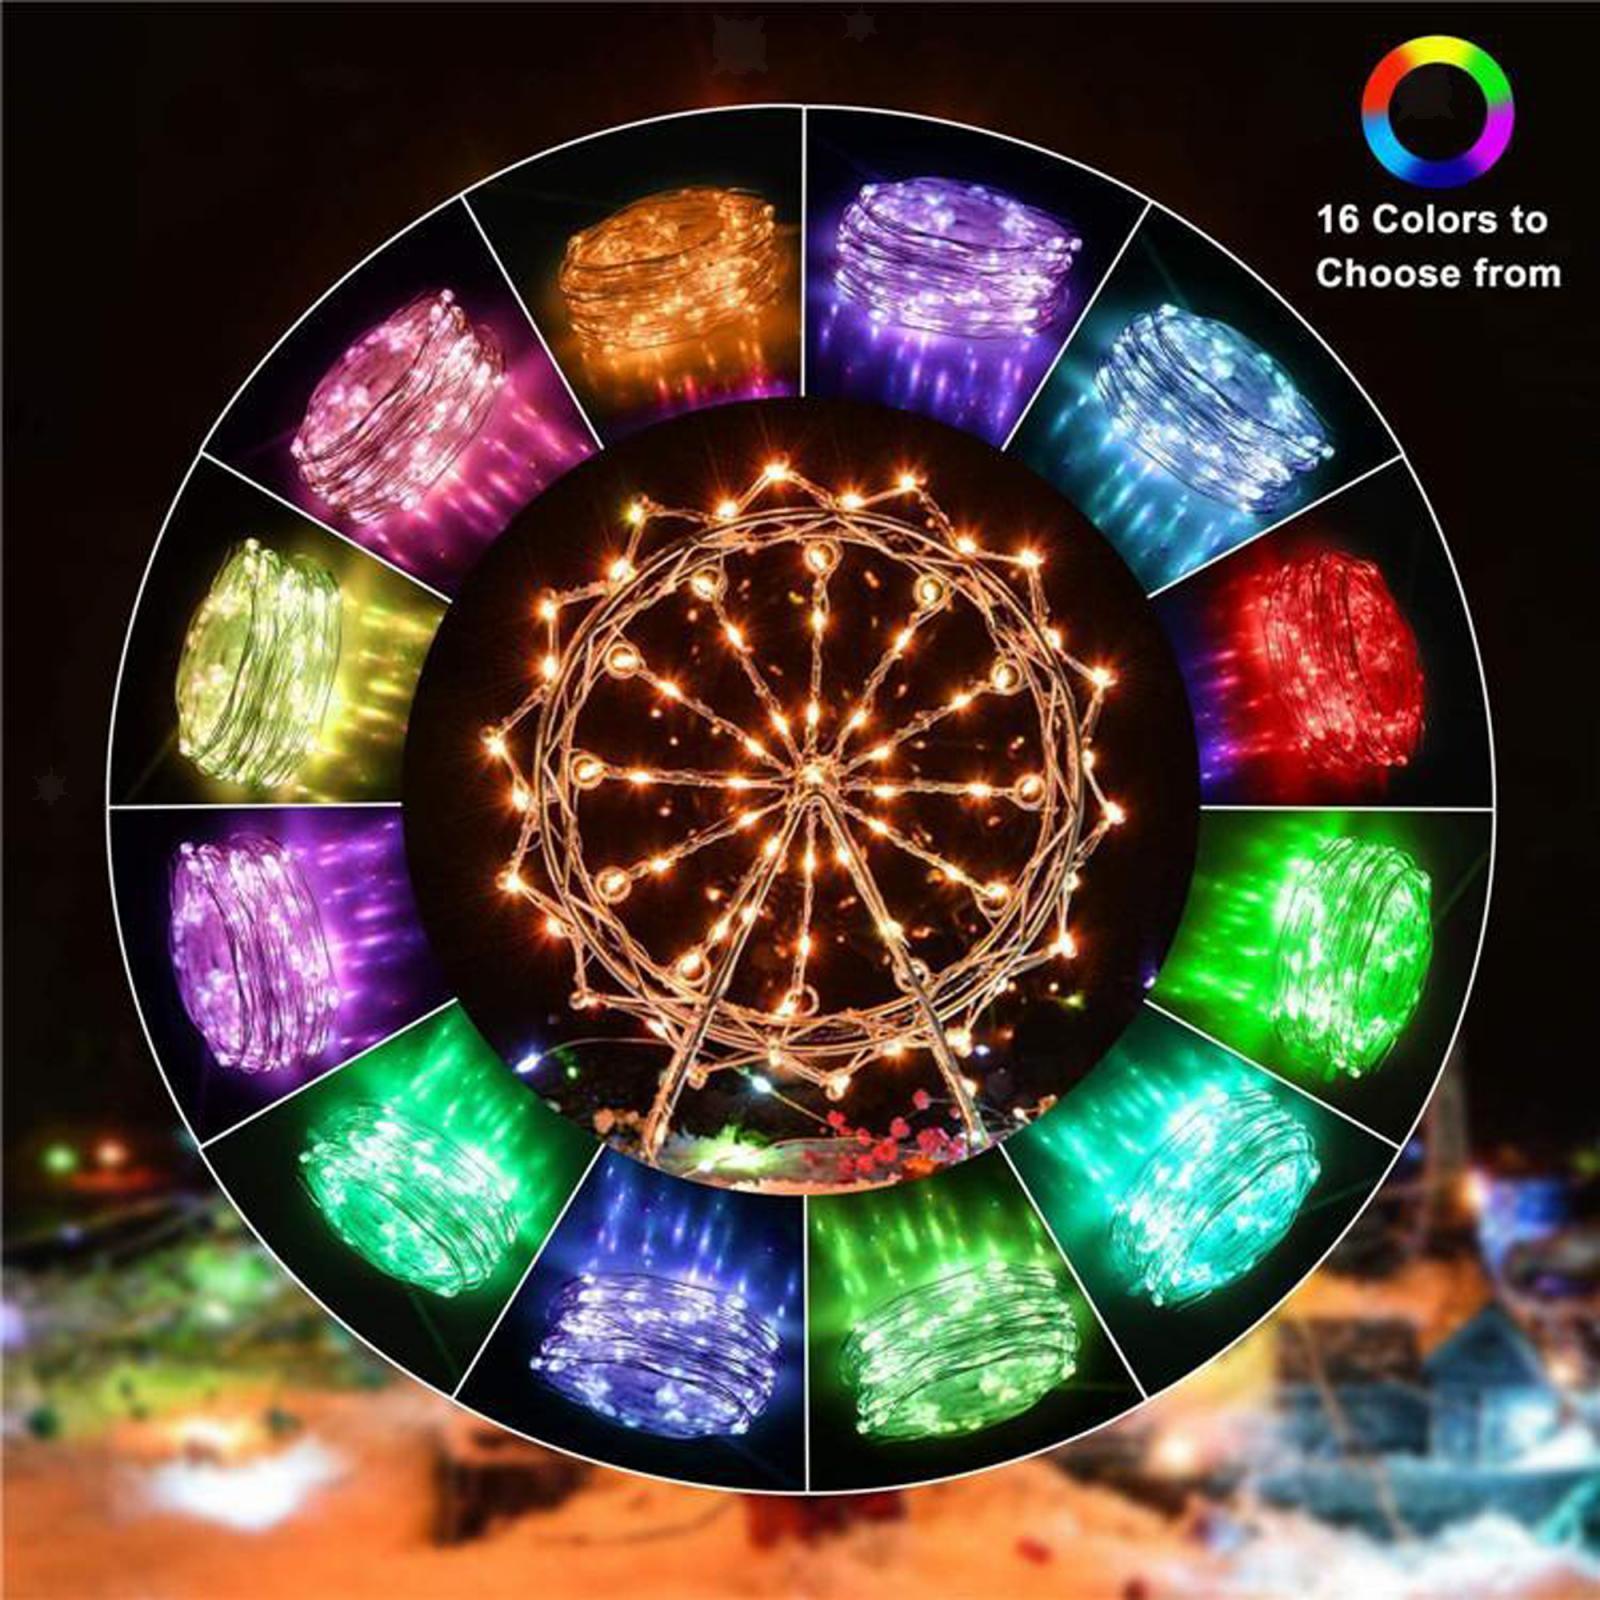 miniature 30 - LED Fée Guirlande Lumineuse Rideau Fenêtre De Mariage Party Decor App Contrôl